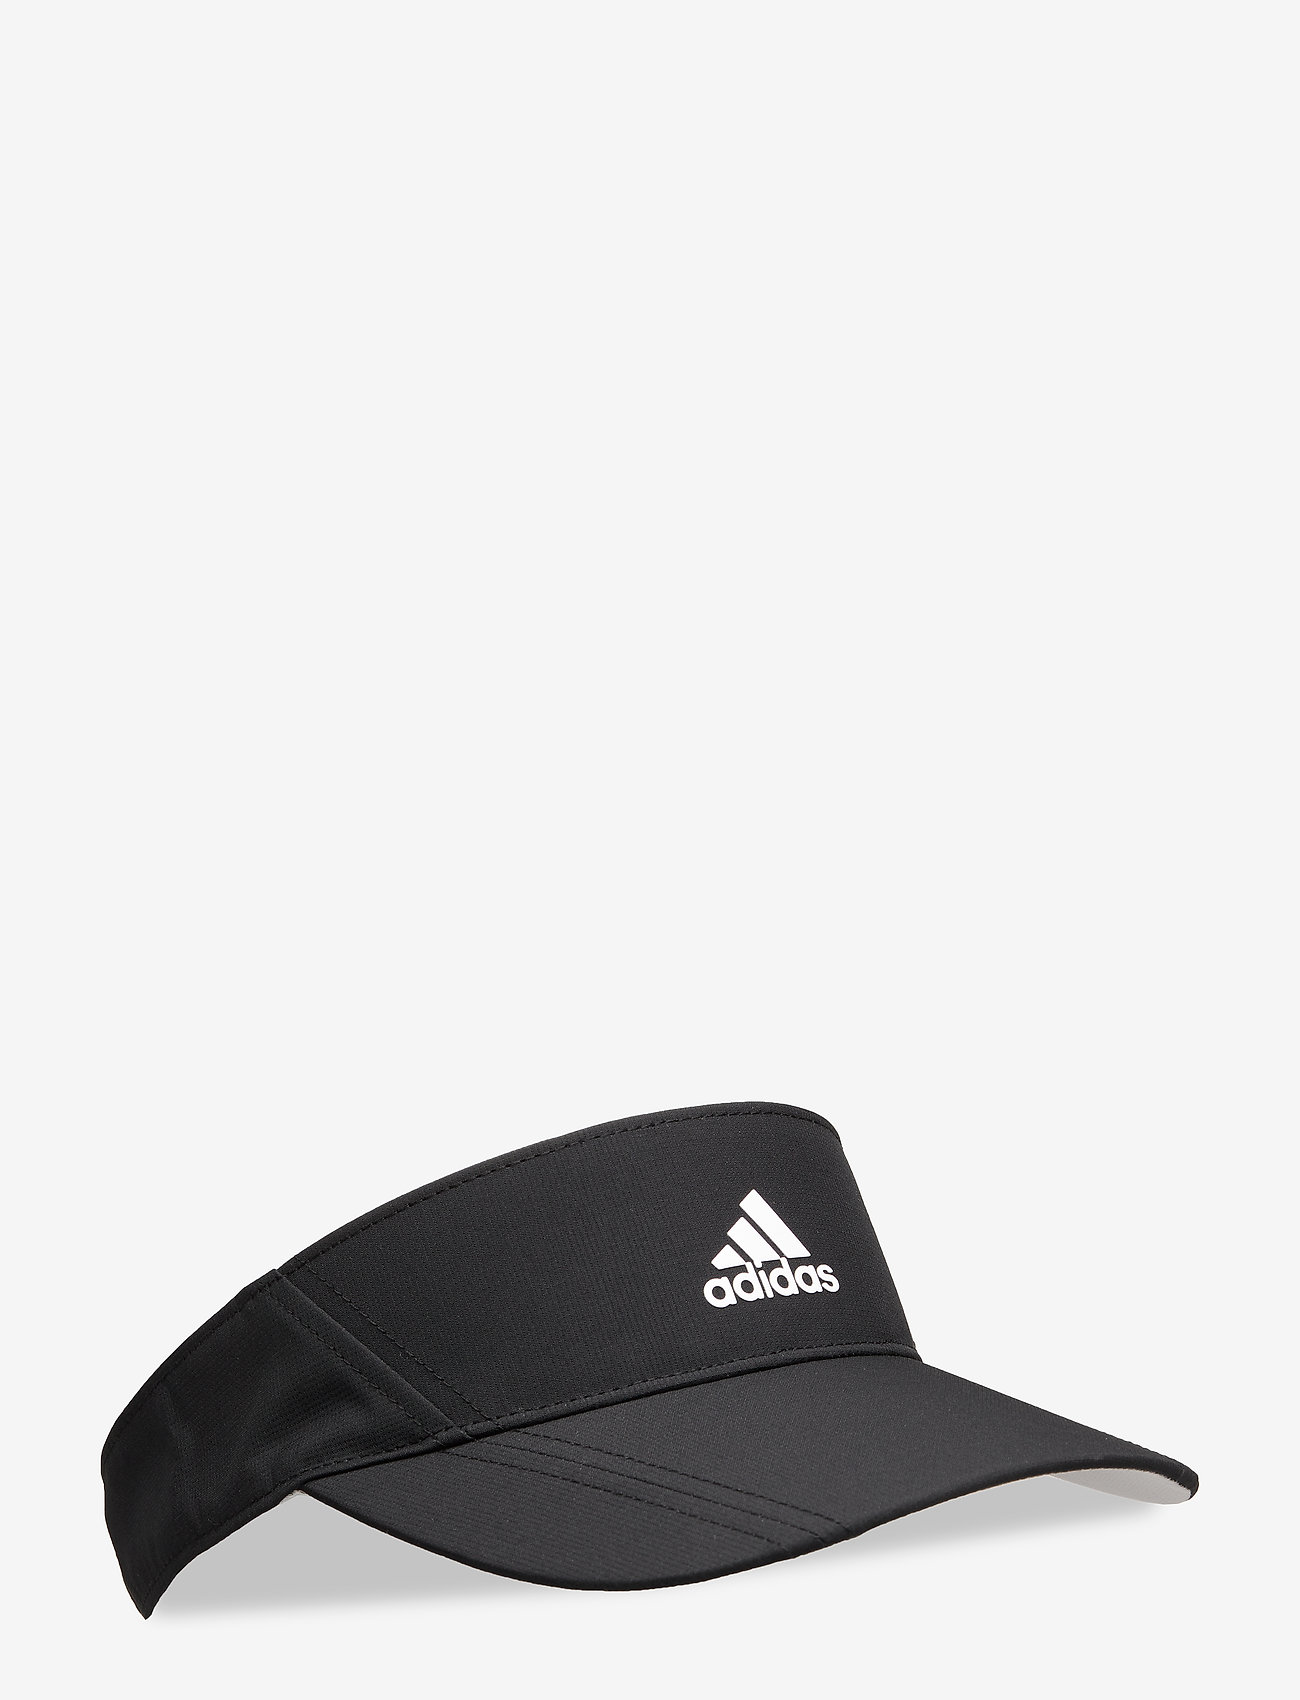 adidas Golf - W CMFRT VSR - caps - black - 0